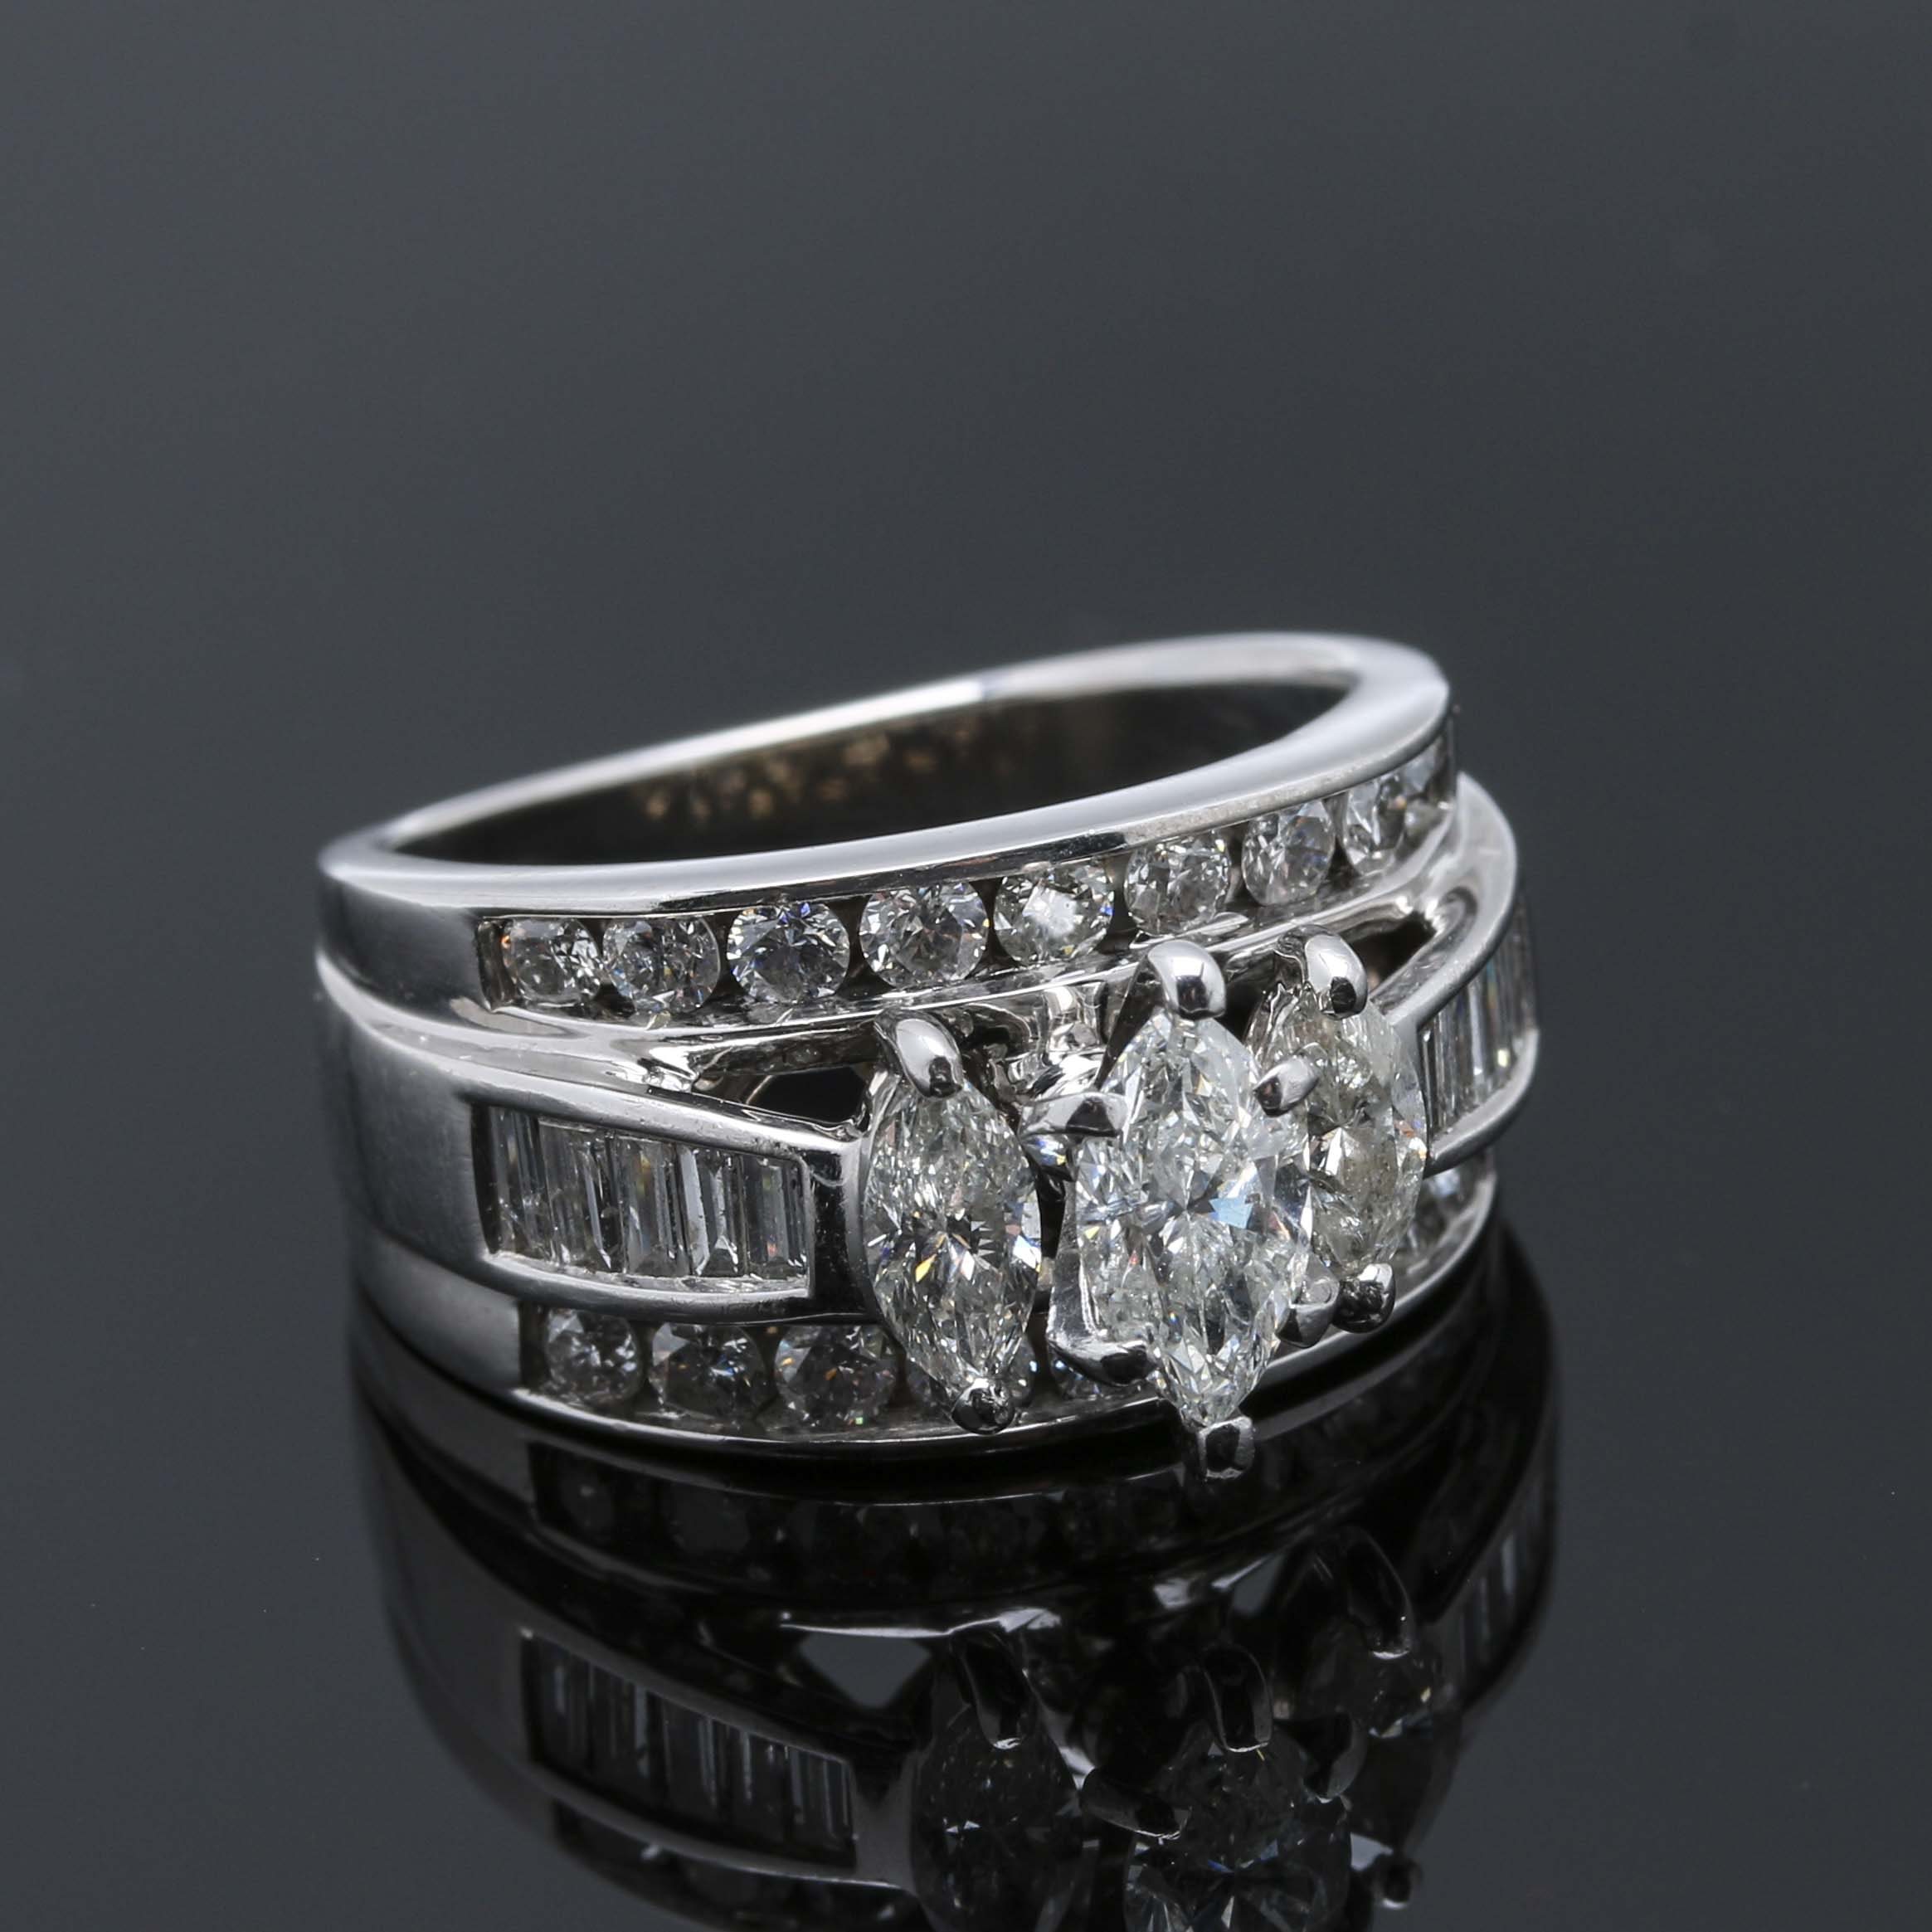 14K White Gold 2.21 CTW Diamond Ring